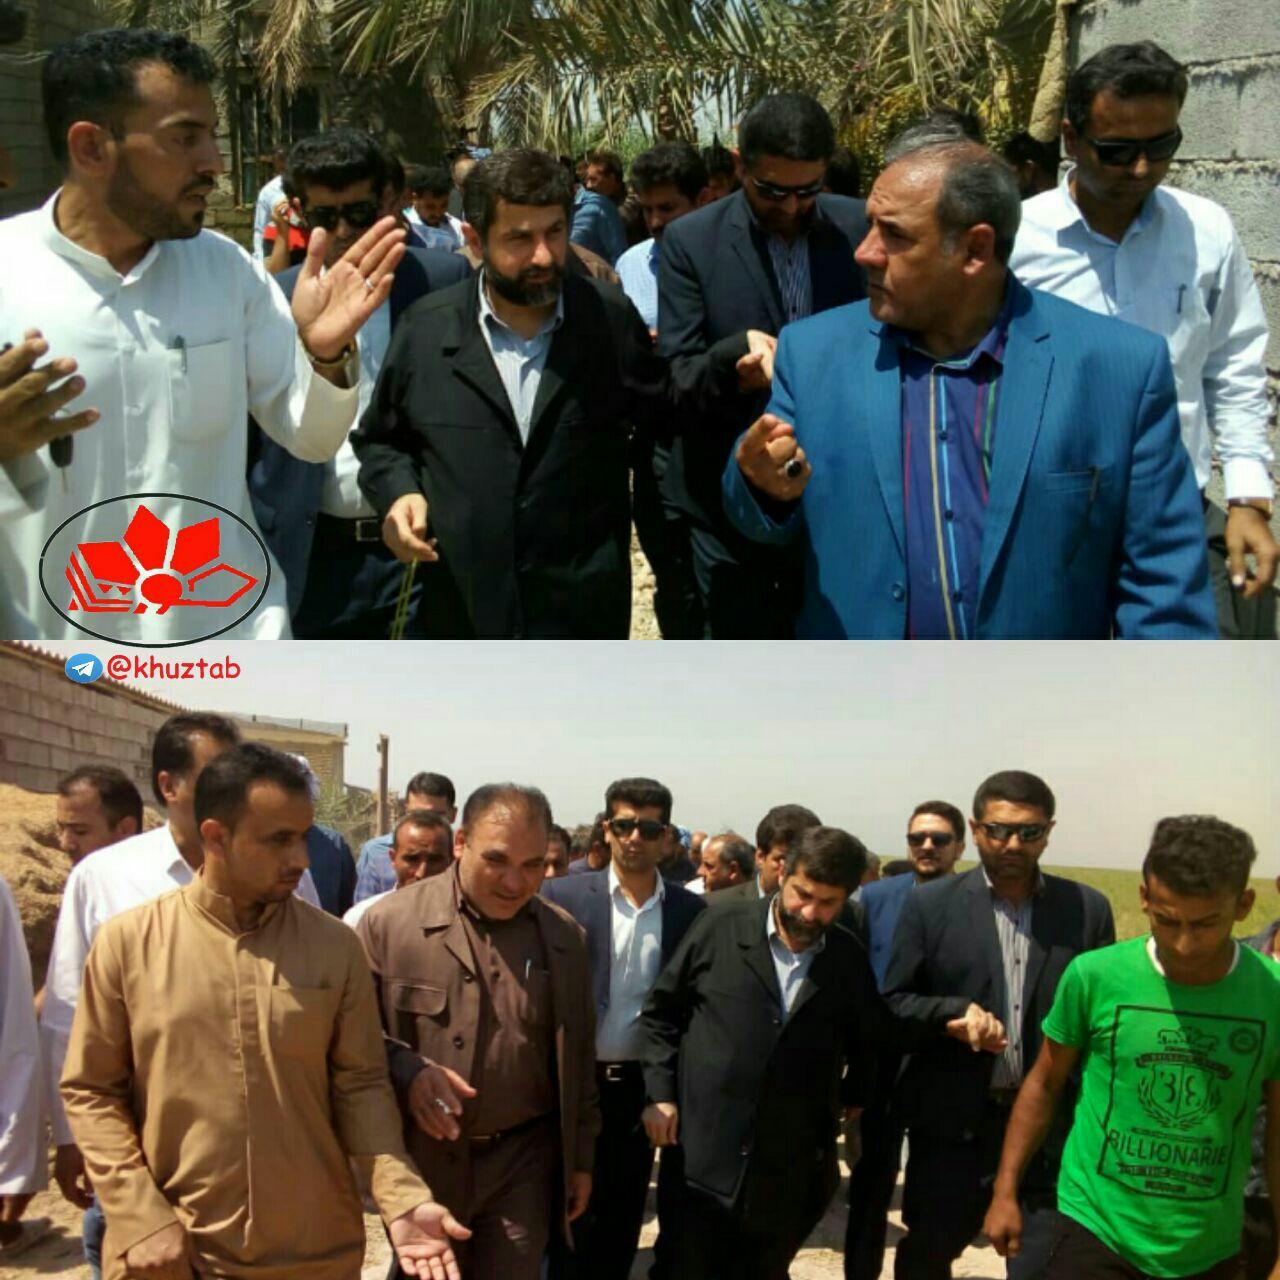 IMG 20190704 205211 660 آغاز پرداخت خسارت کشاورزان از روز شنبه/ تانکرهای آبرسان از کل کشور به خوزستان میآیند